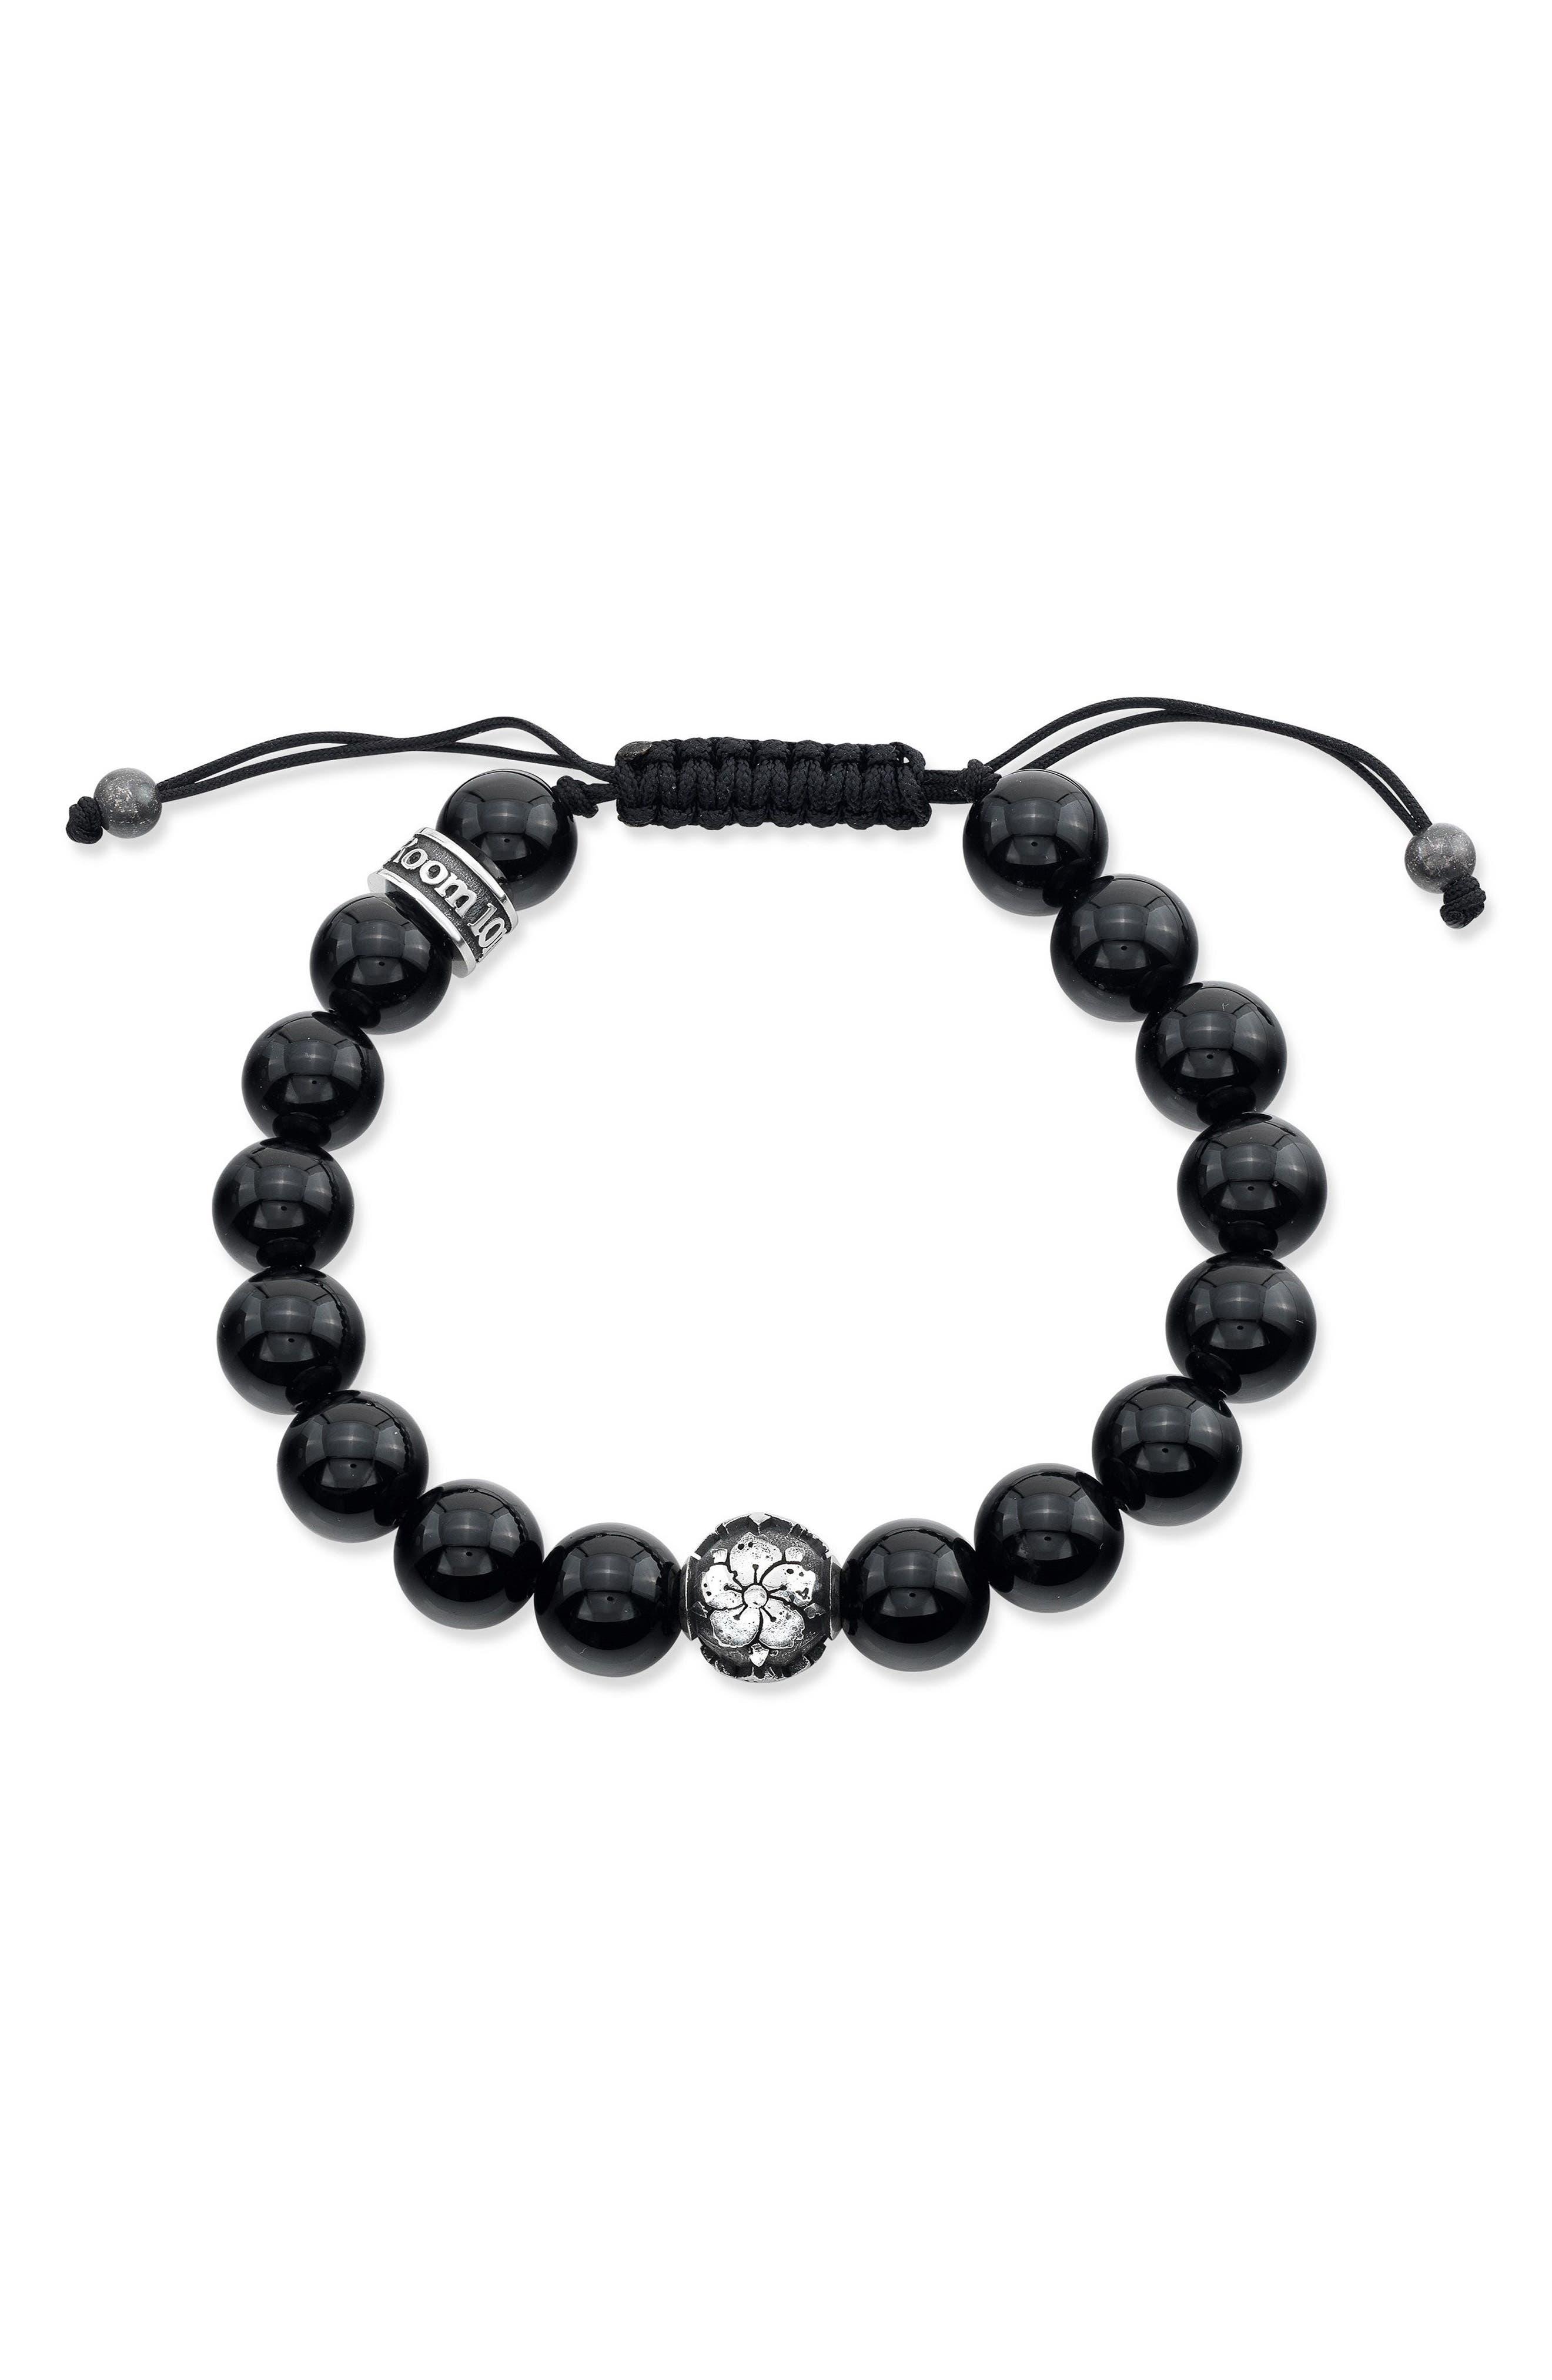 Main Image - Room101 Agate Bead Shamballa Bracelet